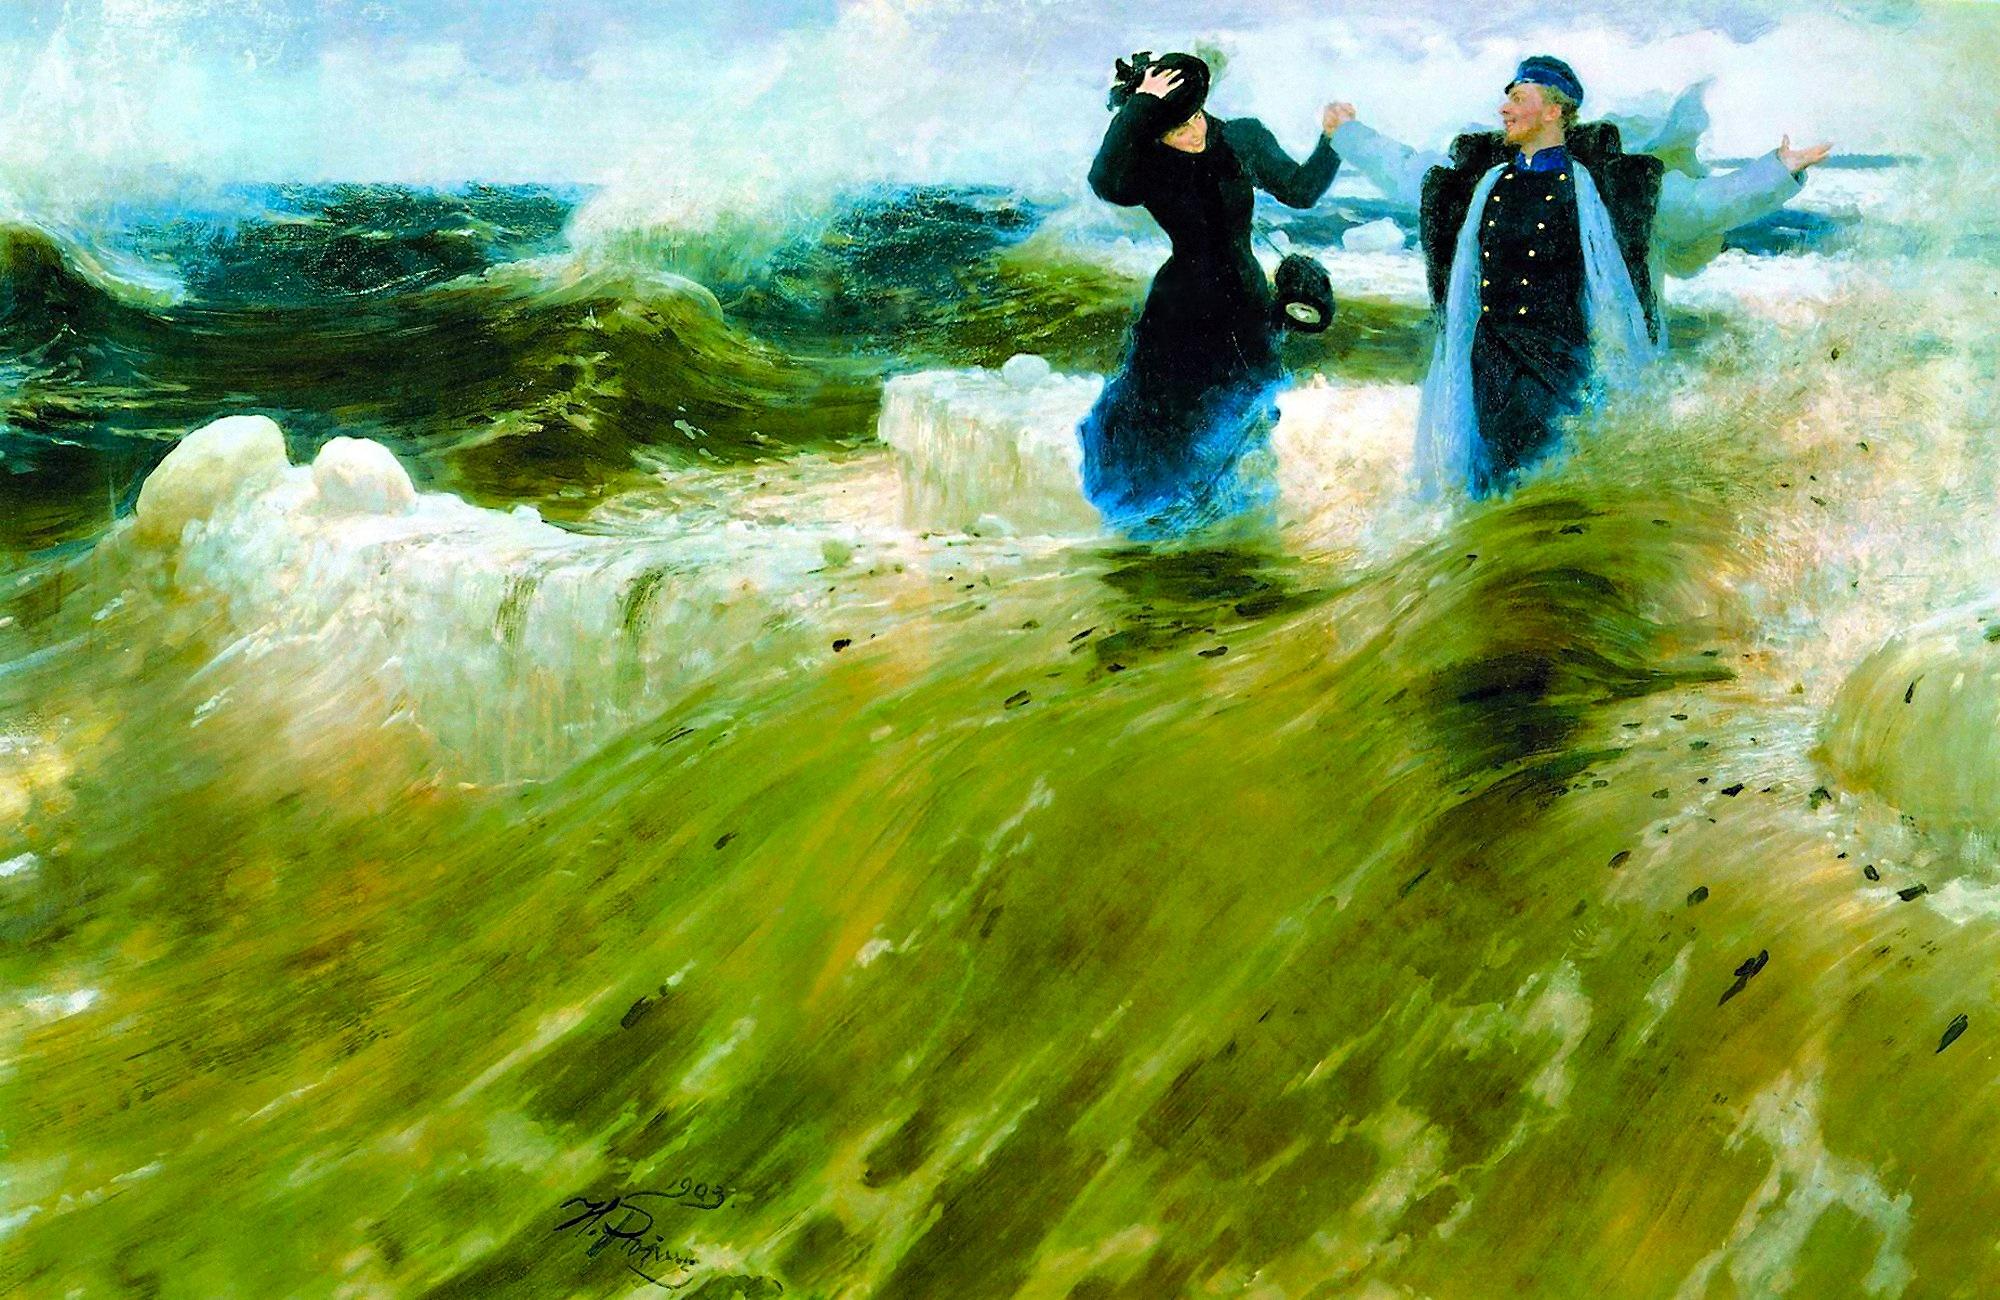 00 Ilya Repin. What Freedom! 1903